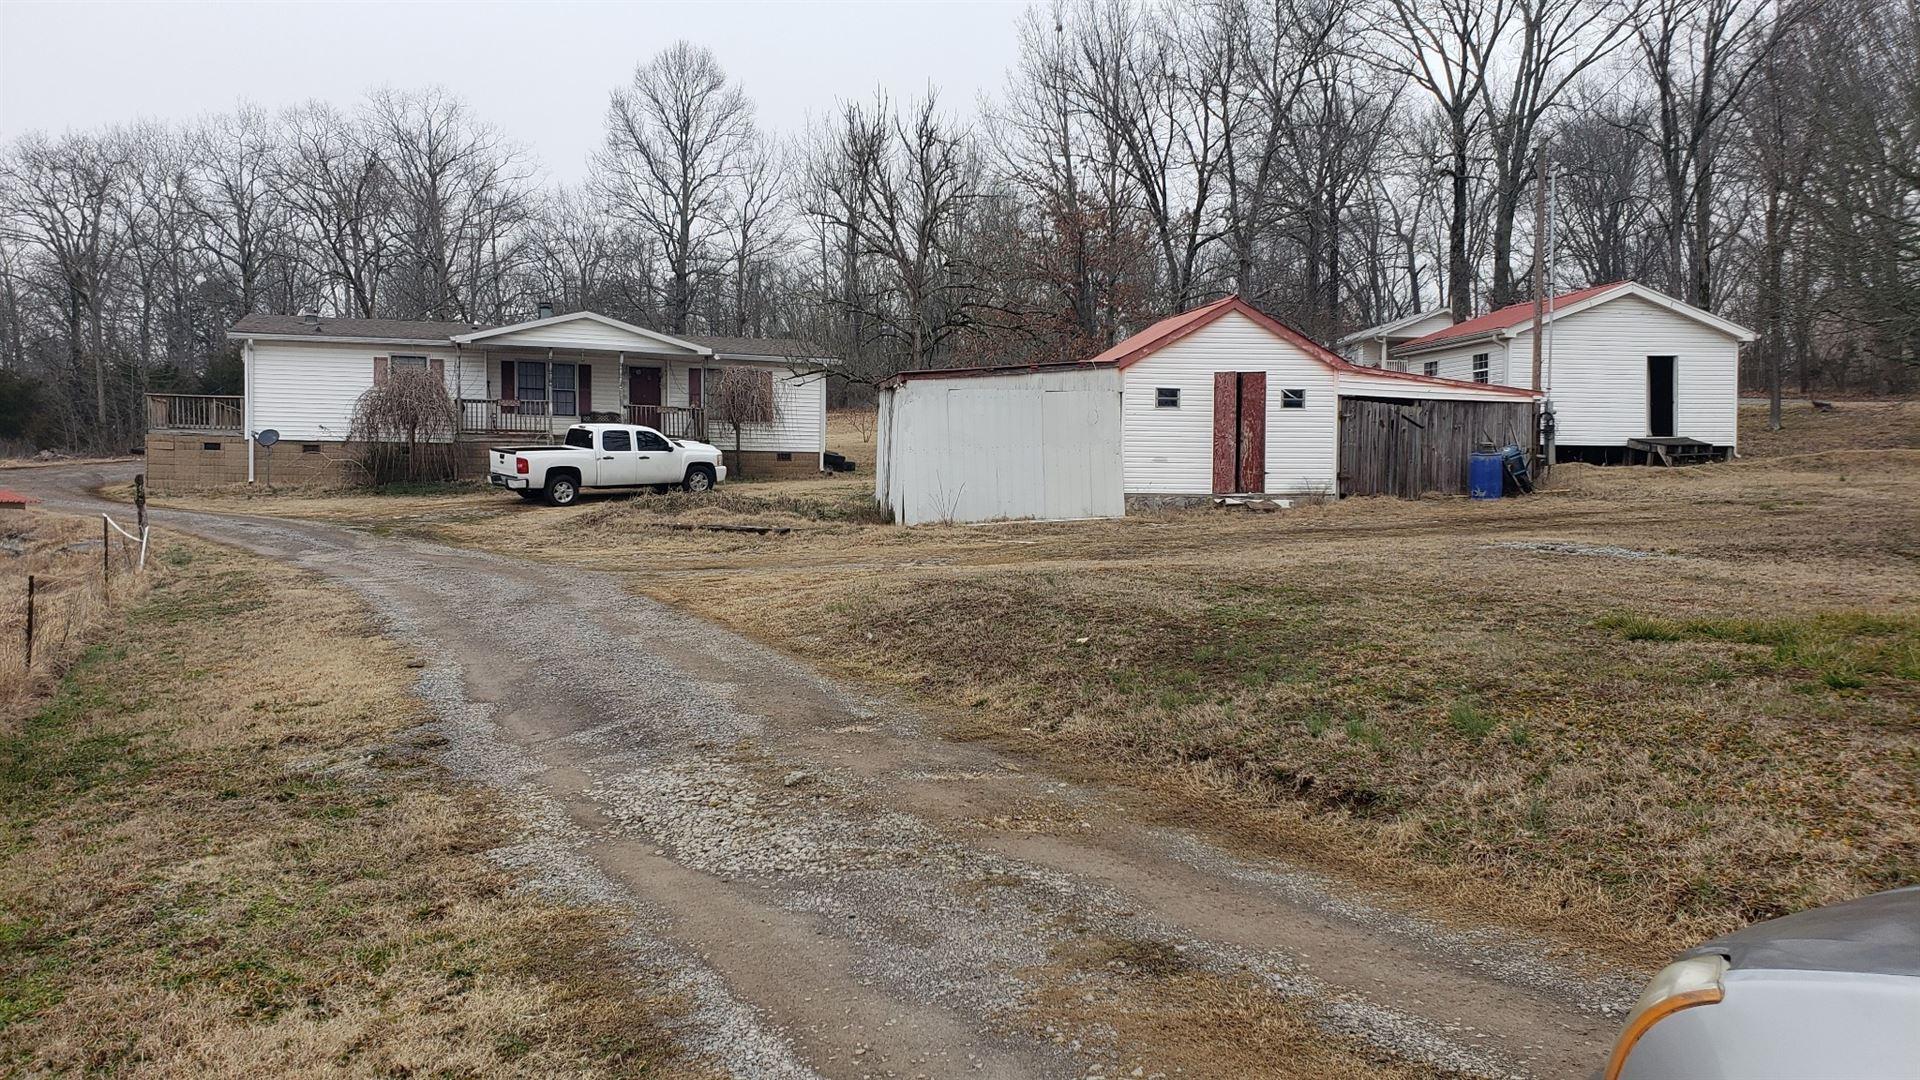 Photo of 7131 W Buckeye Bottom Rd, Murfreesboro, TN 37129 (MLS # 2228902)